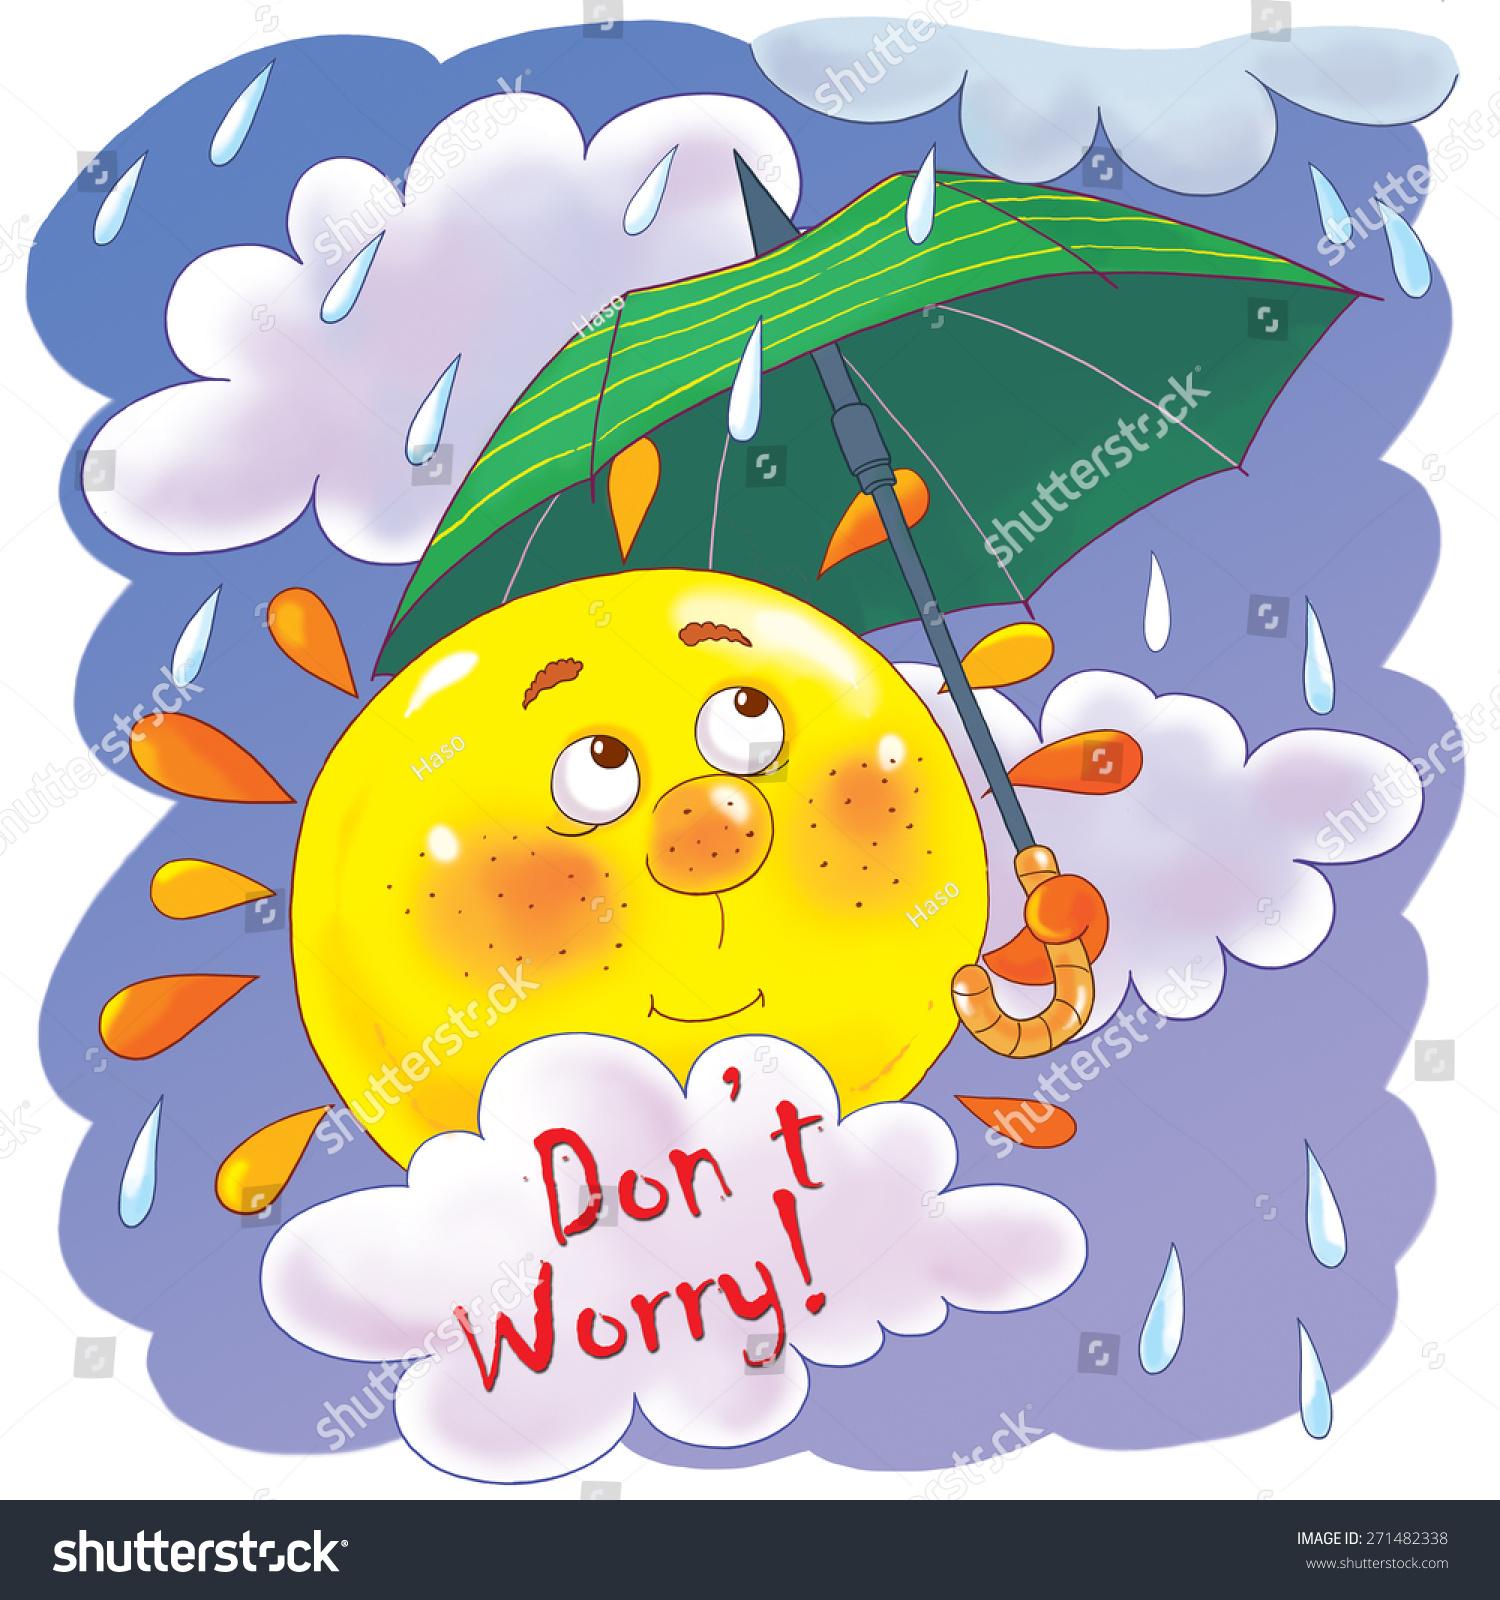 Cute Rainy Day: Cute Sun With An Umbrella, Clouds And Rain. Rainy Day